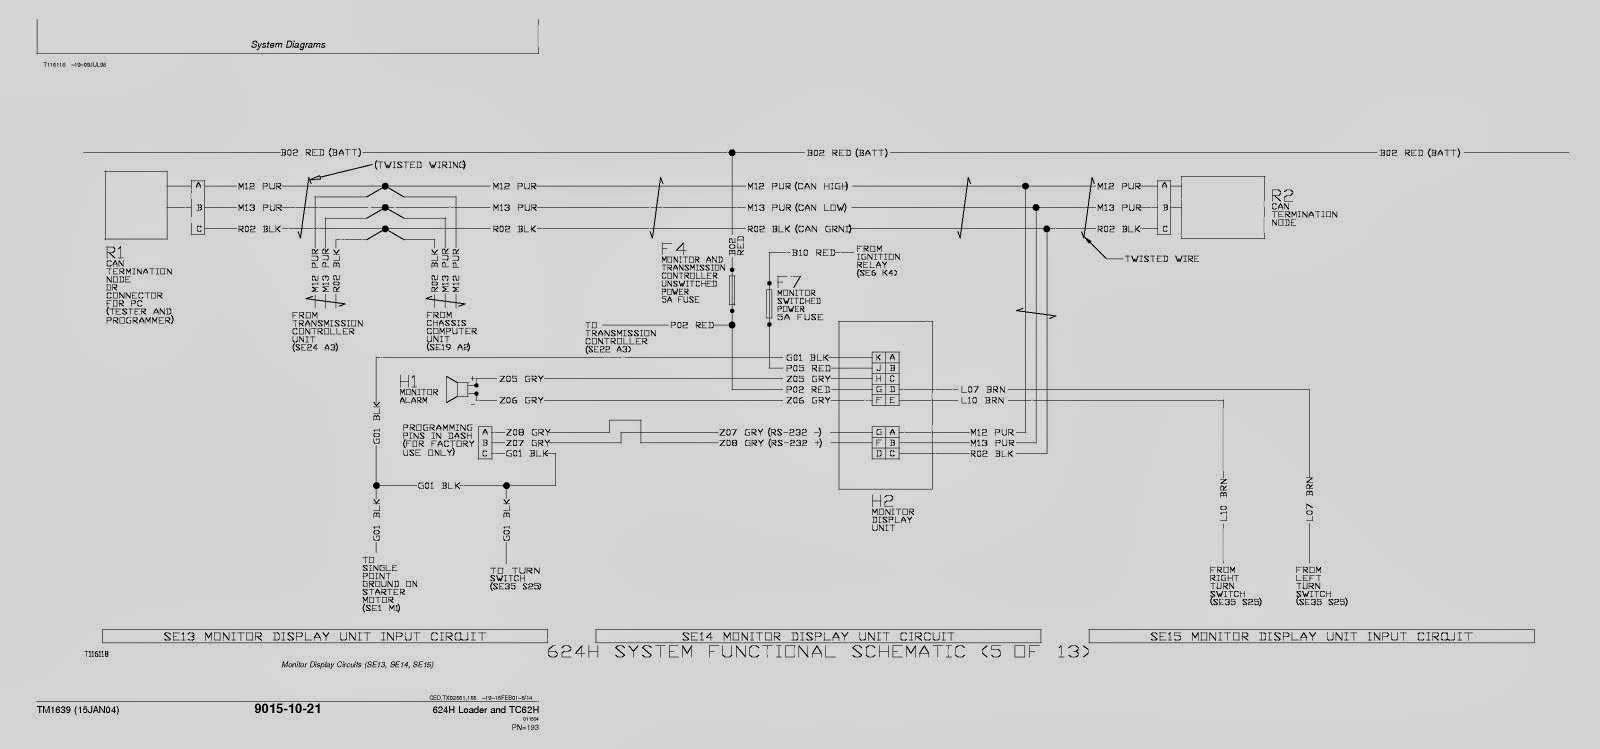 john owner manual john deere 3225b on john deere parts diagrams john deere solenoid wiring  [ 1600 x 749 Pixel ]